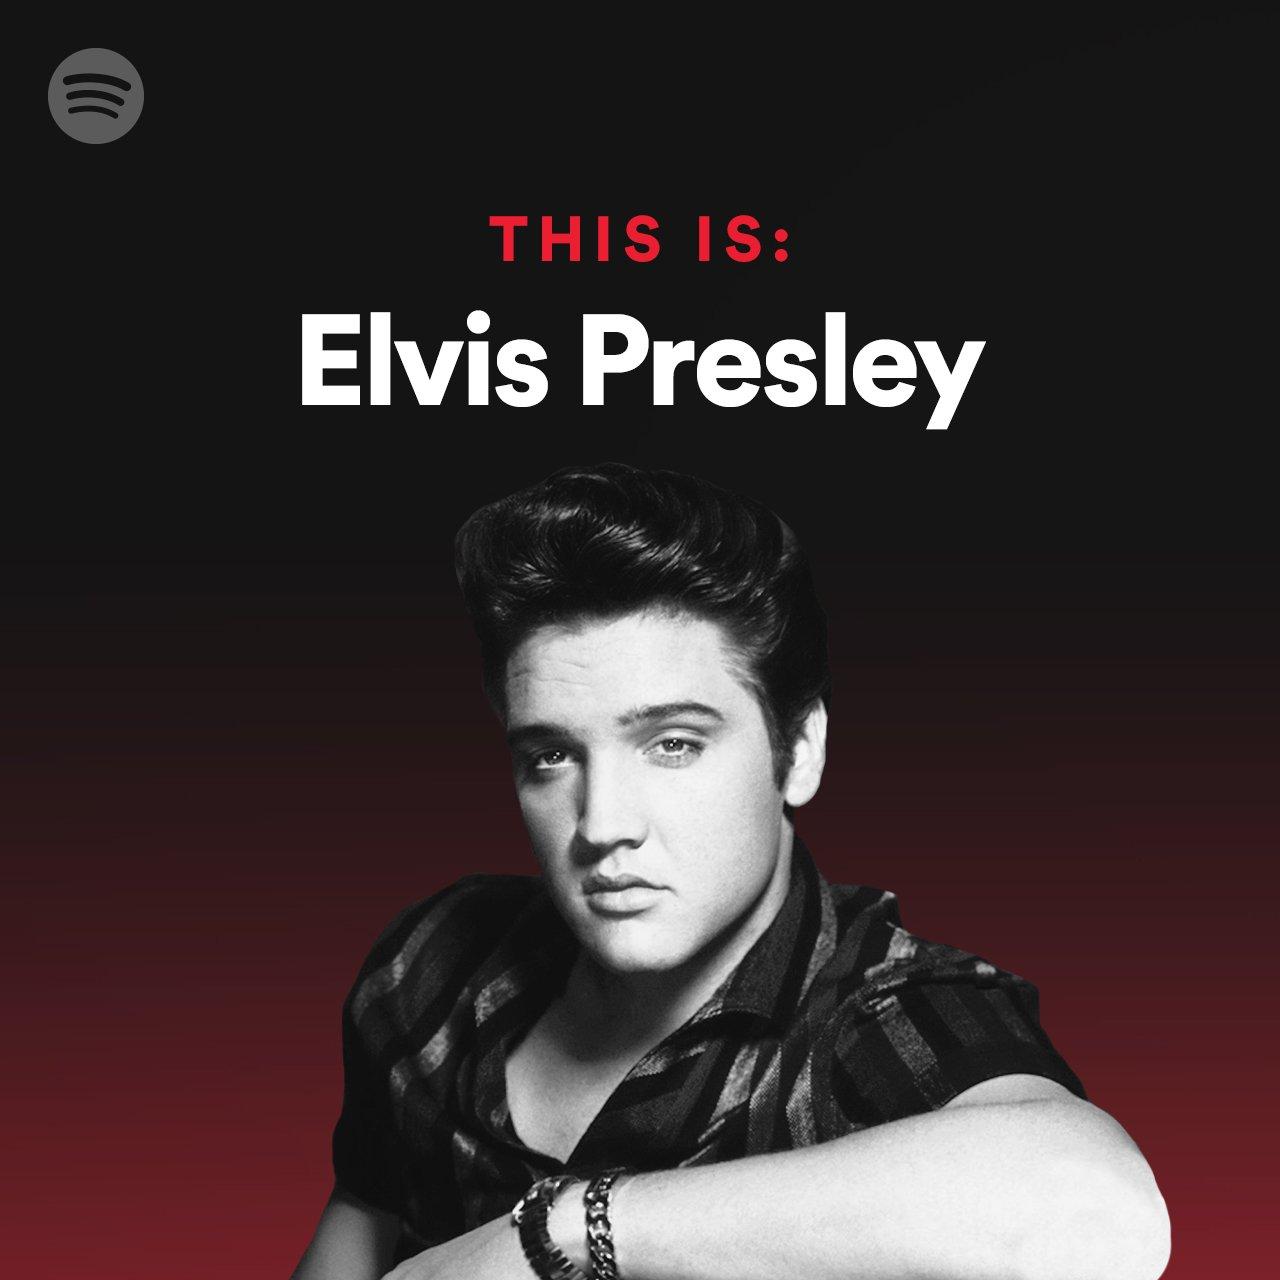 We can't help falling in love with the King. Happy birthday, Elvis.  https://t.co/lUiQ8jcQJe https://t.co/0n1eaB7II2